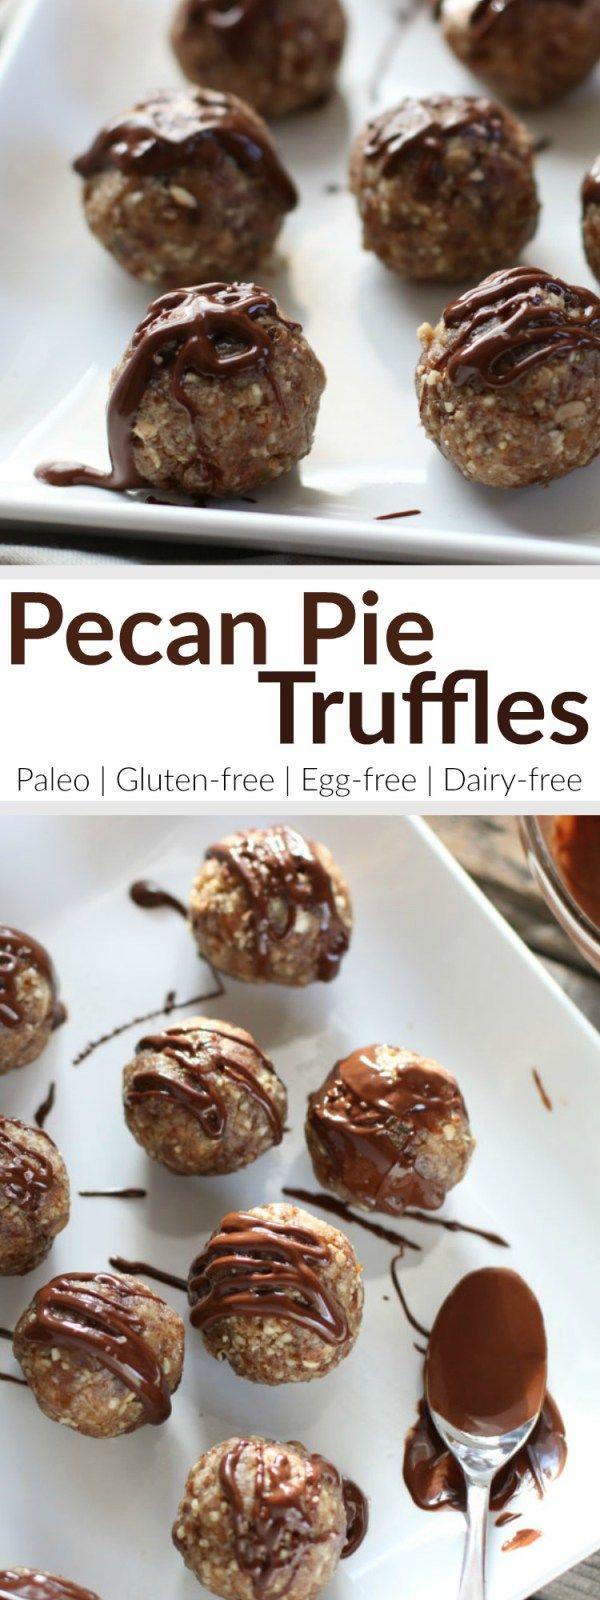 ... irresistible No-Bake Pecan Pie Truffles | Paleo | Grain-free | Gluten